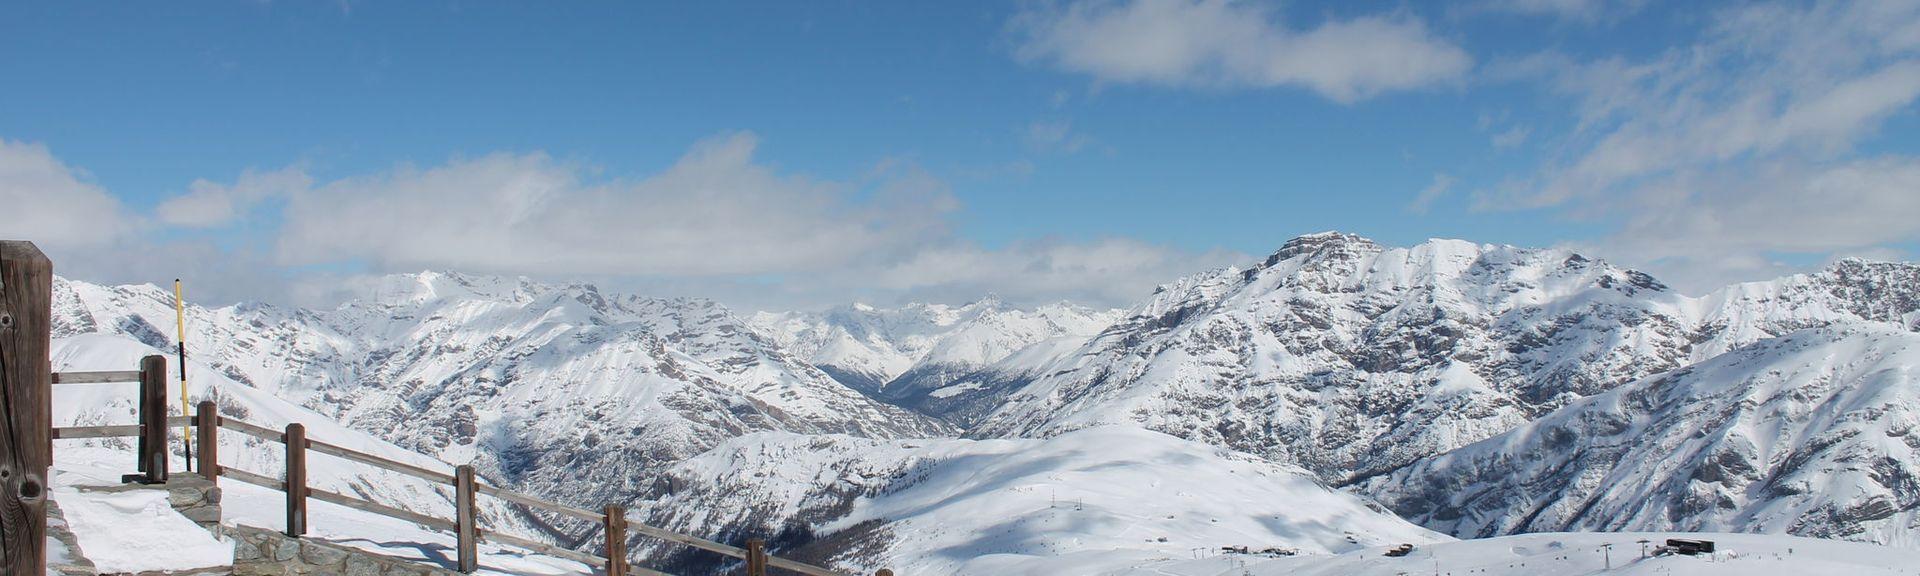 Zona de esquí de Livigno, Livigno, Lombardía, Italia